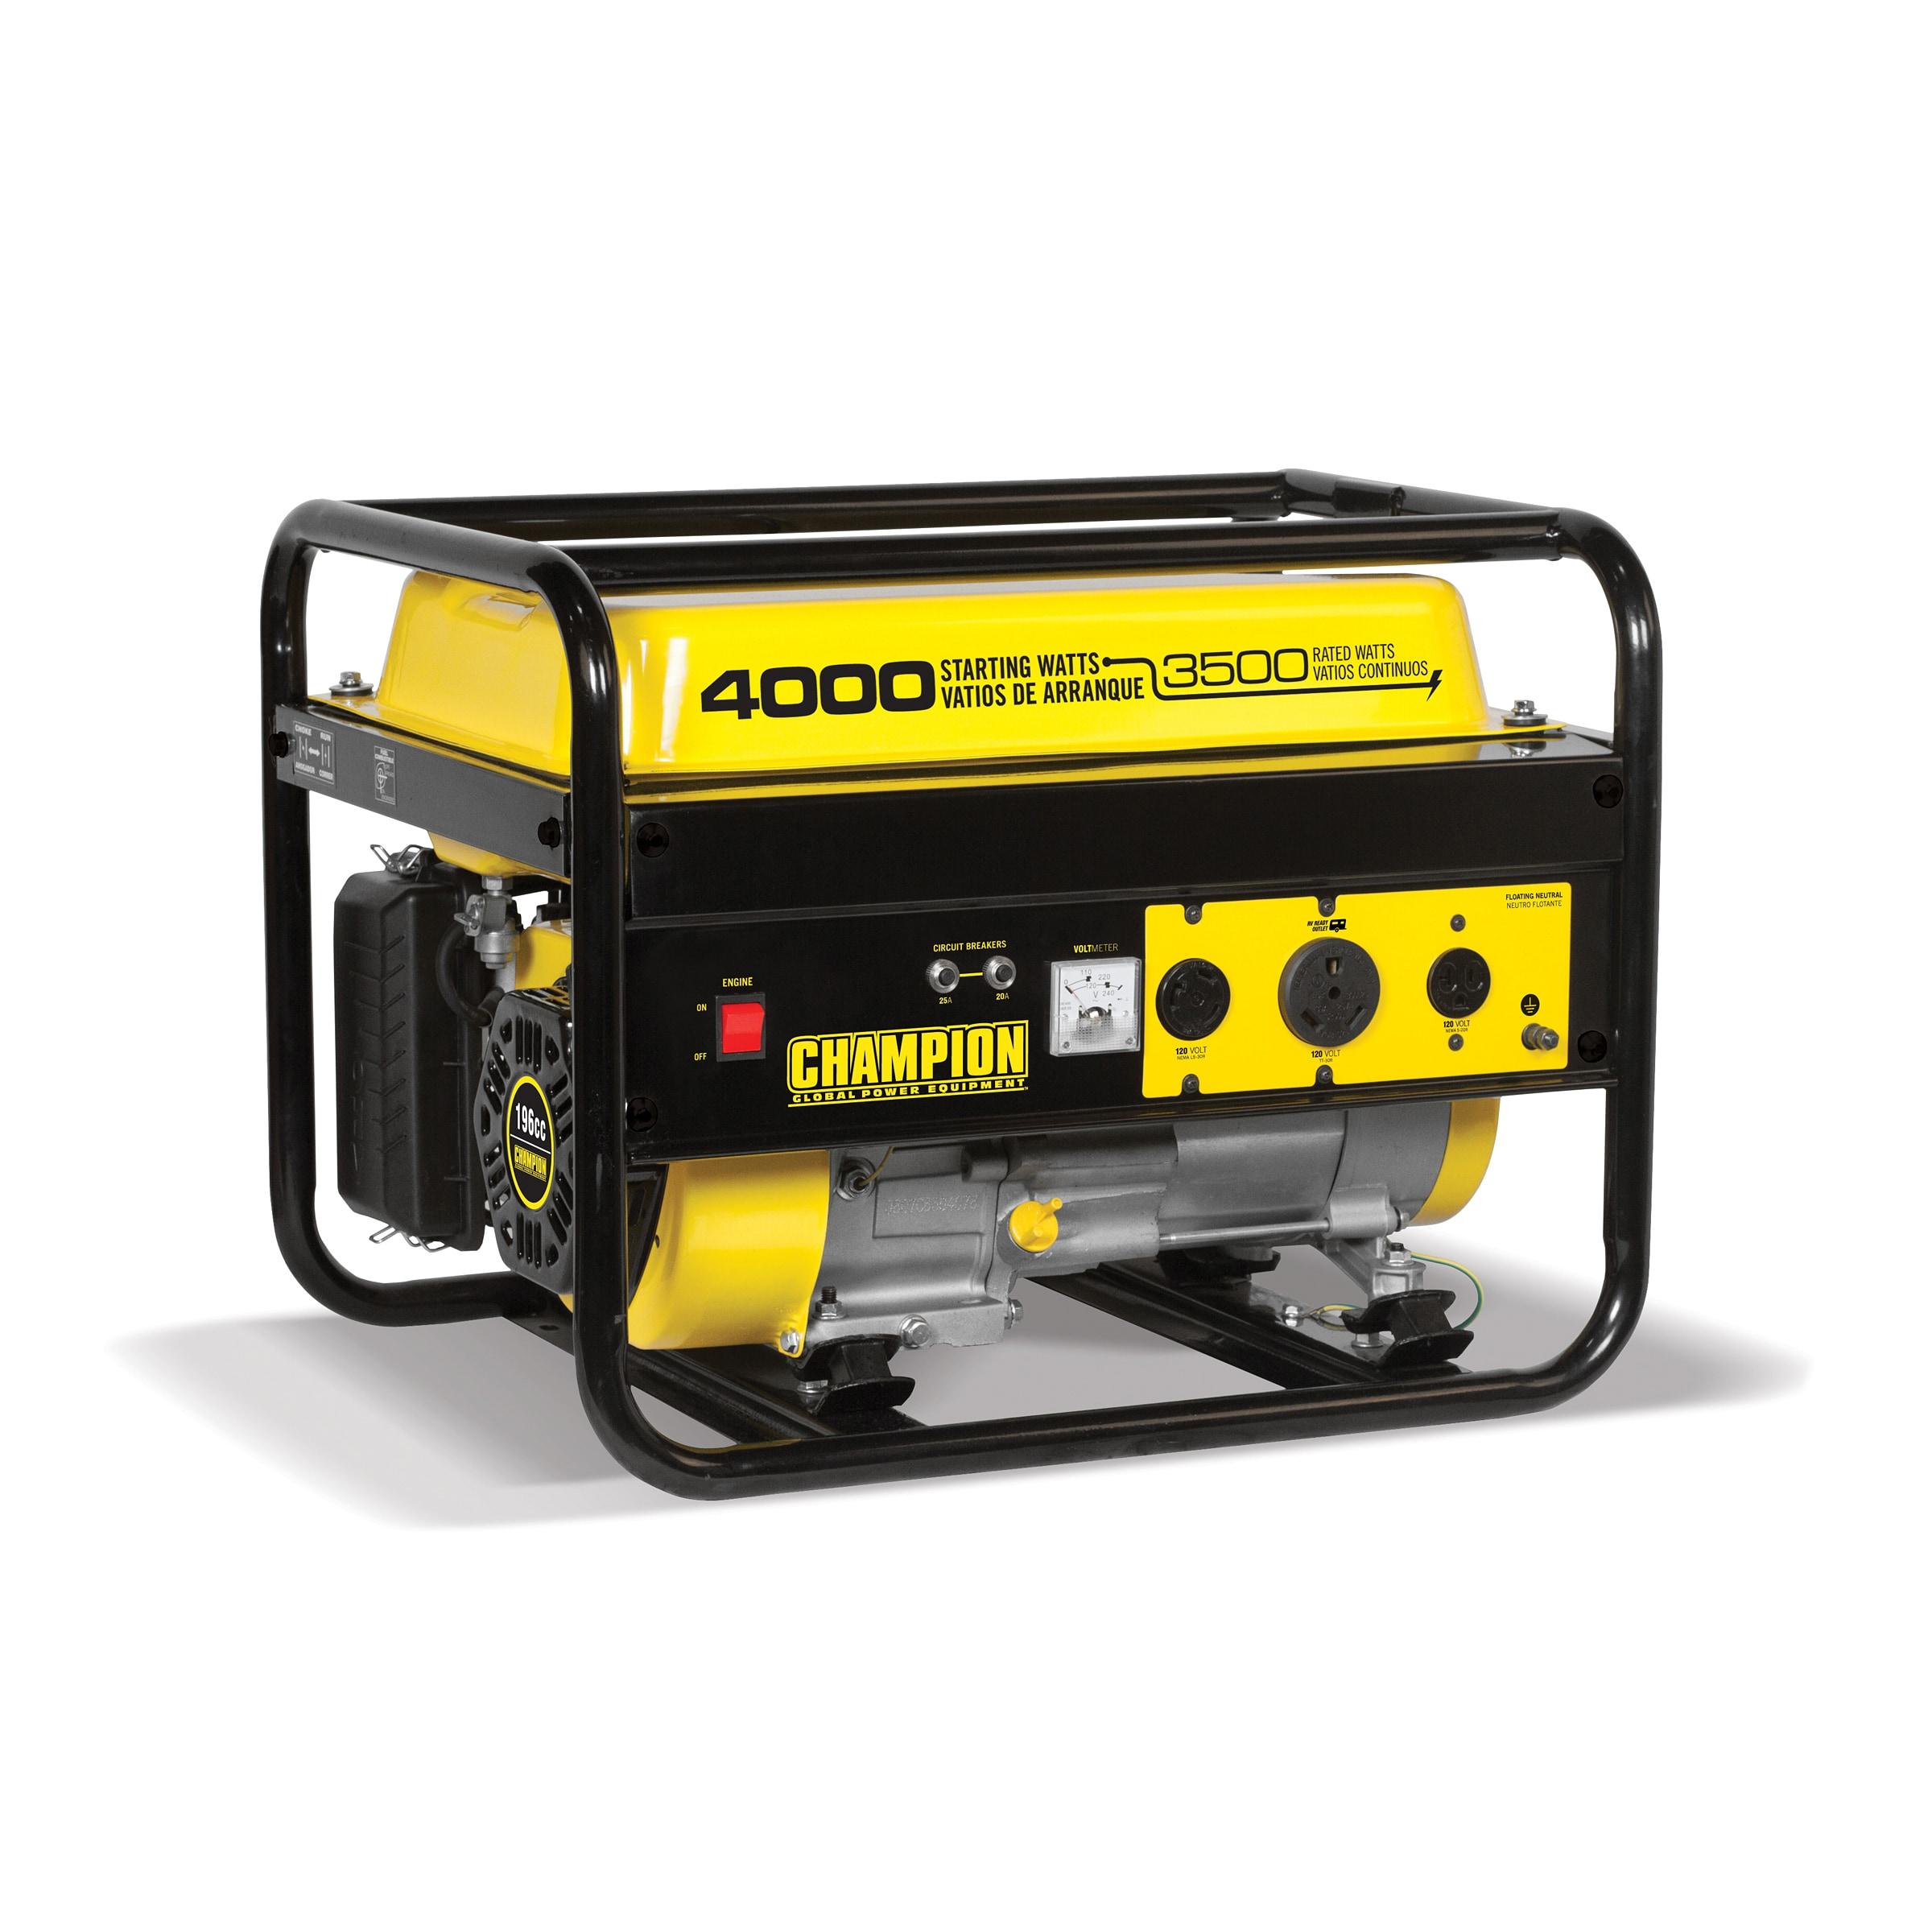 Champion Generator Wiring 4000 Diagram Sidecar Shop 3500 Watt Rv Ready Portable Epa Free